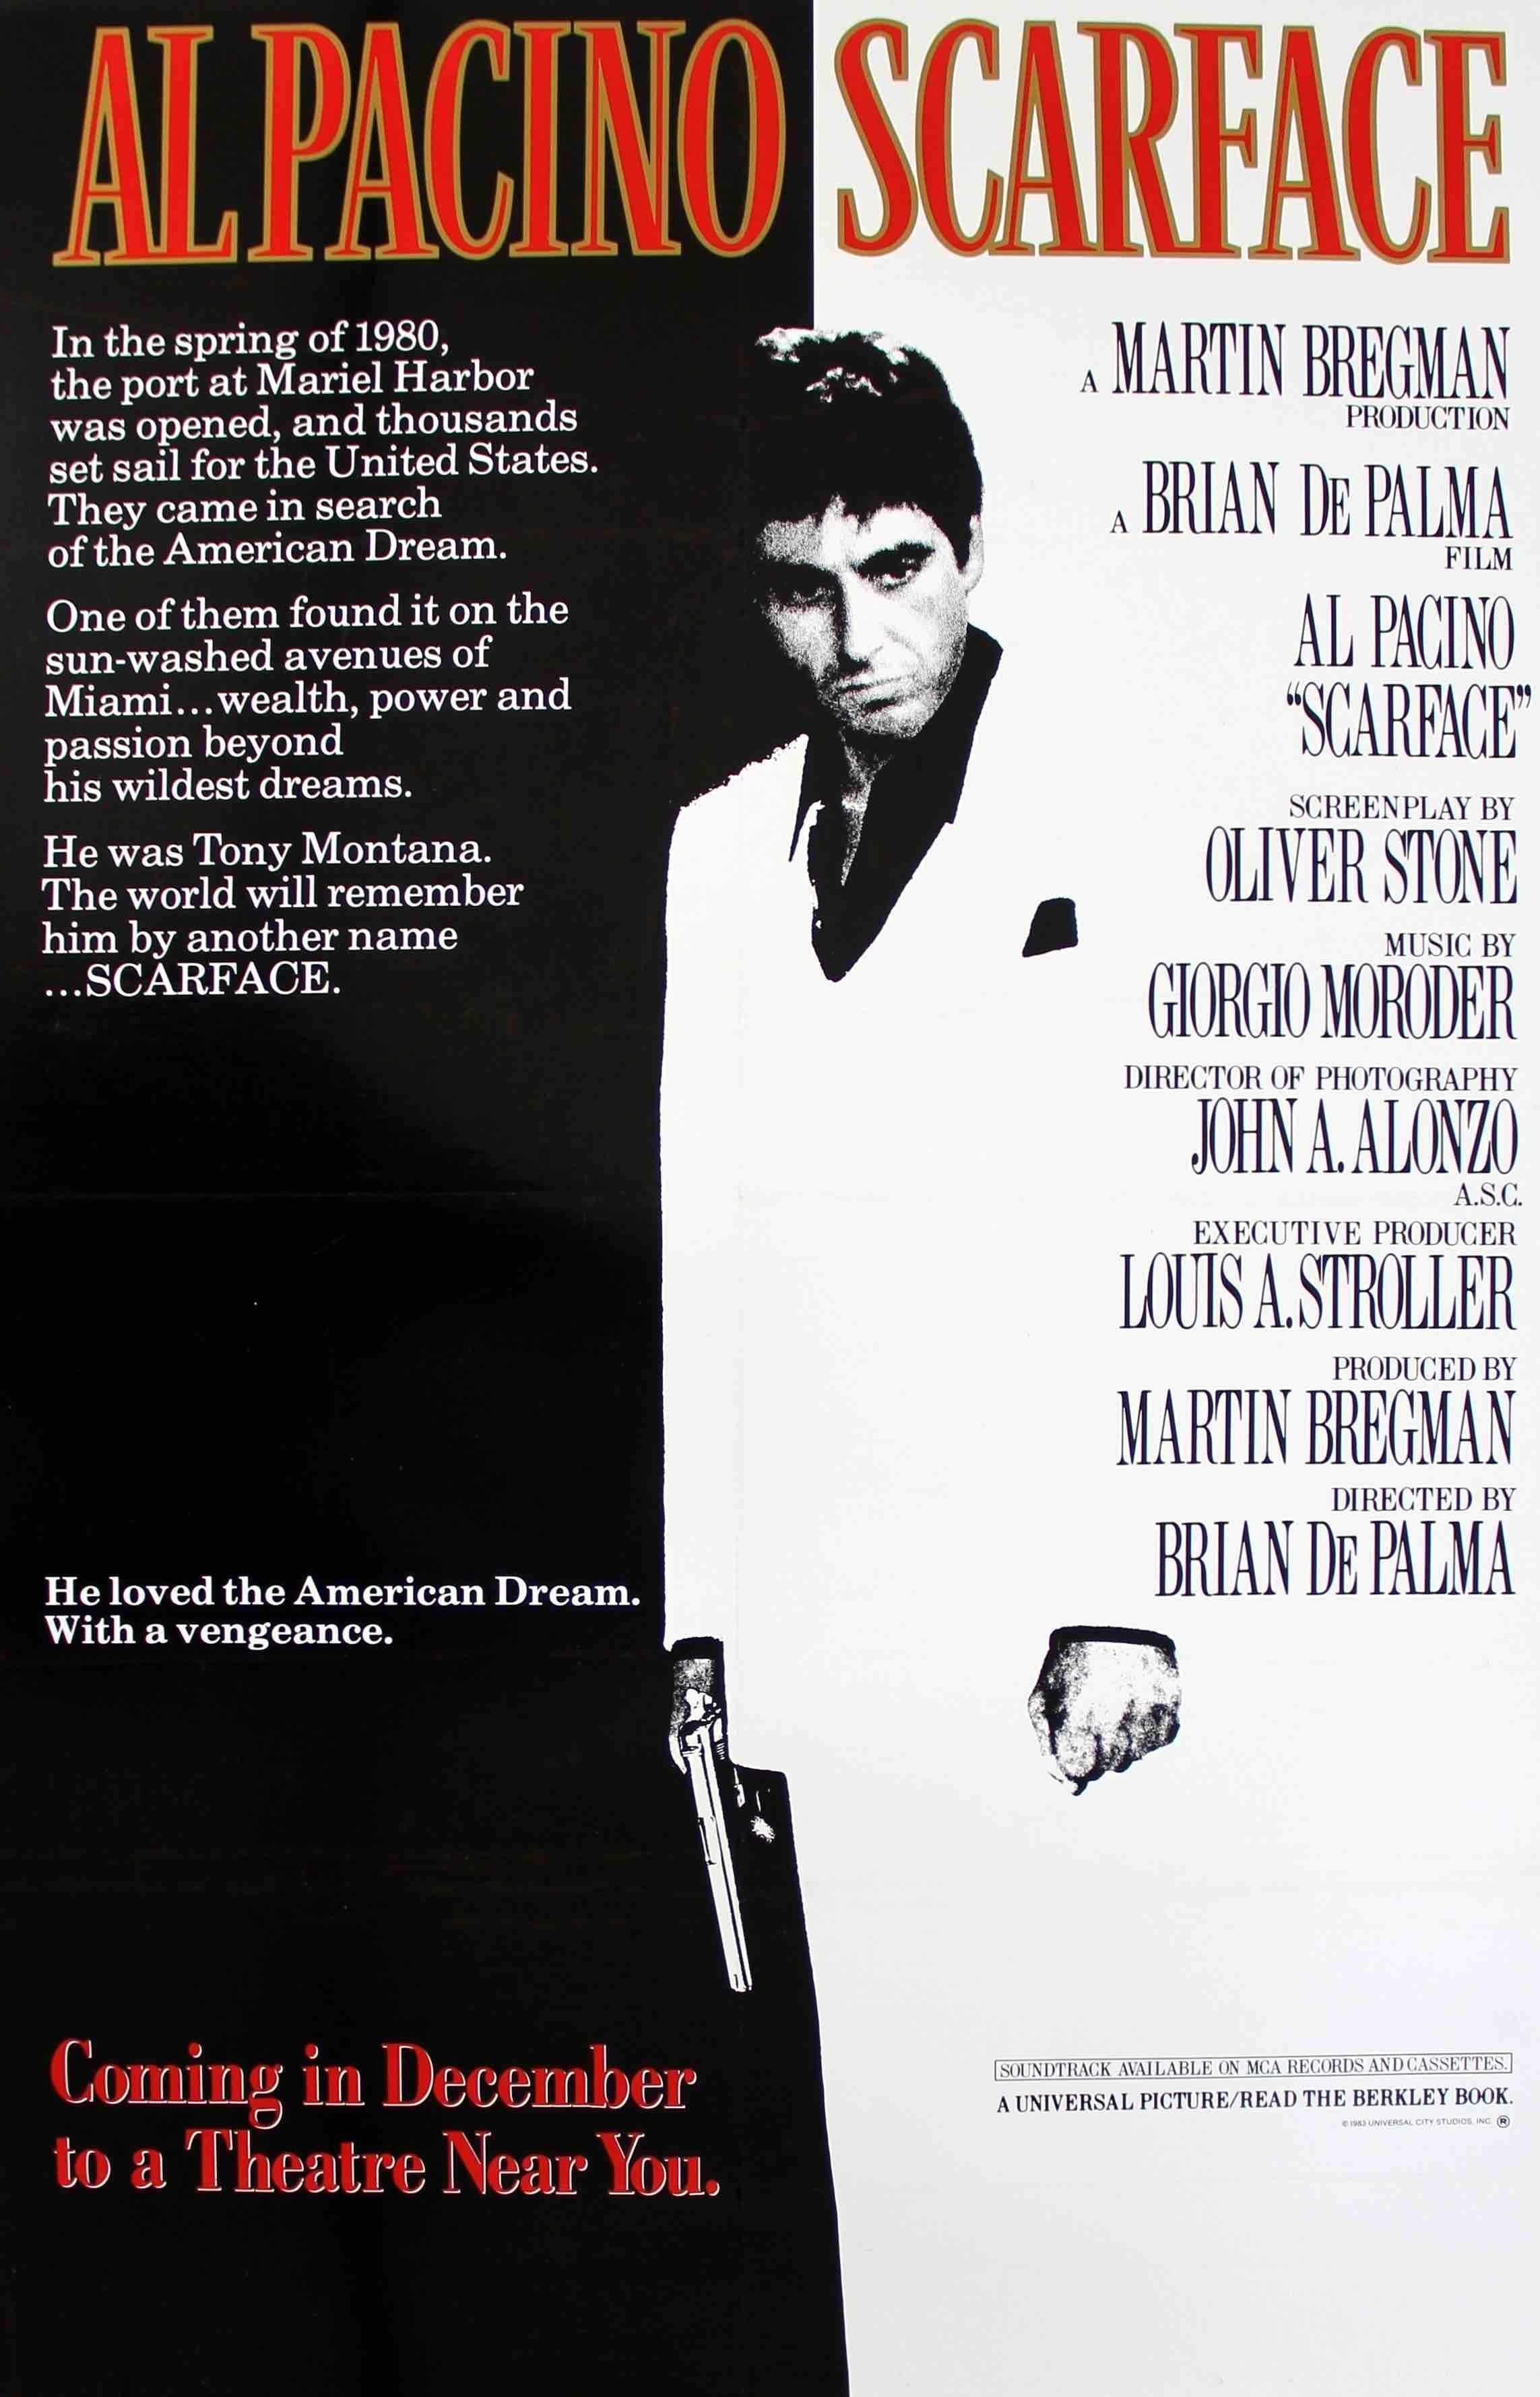 Scarface (1983) in 2018 | FILM SCHOOL | Pinterest | Movies, Movie ...